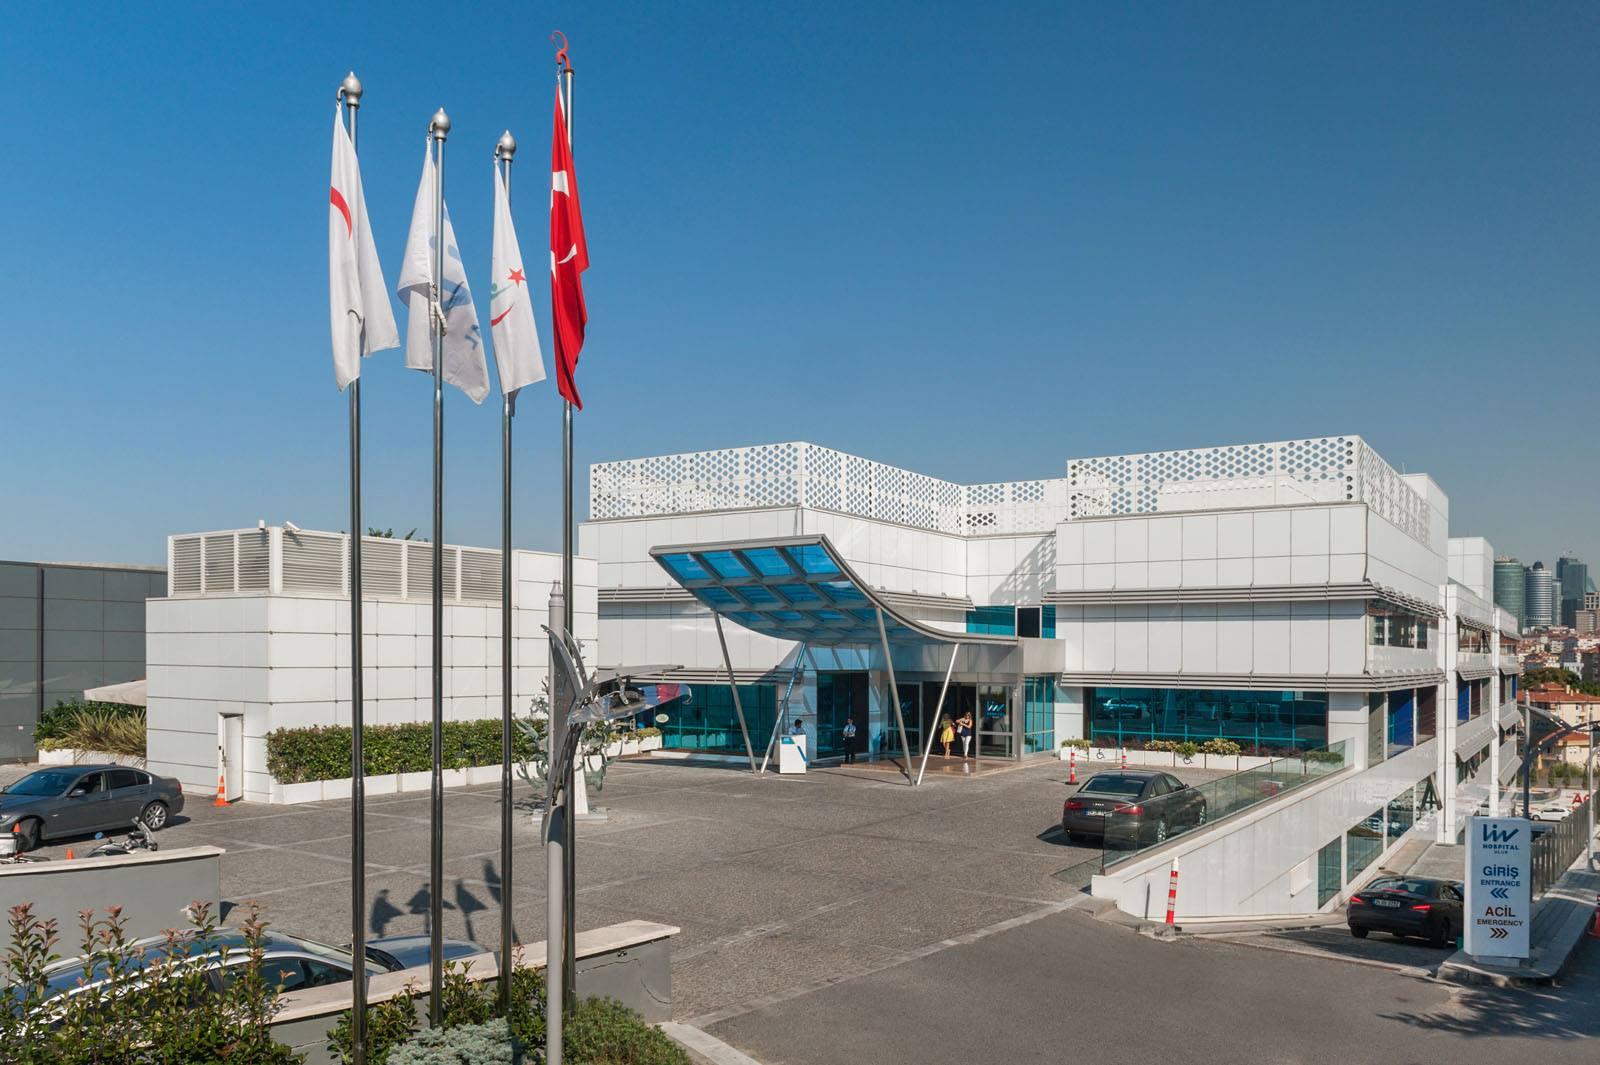 LIV HOSPITAL - ISTANBUL